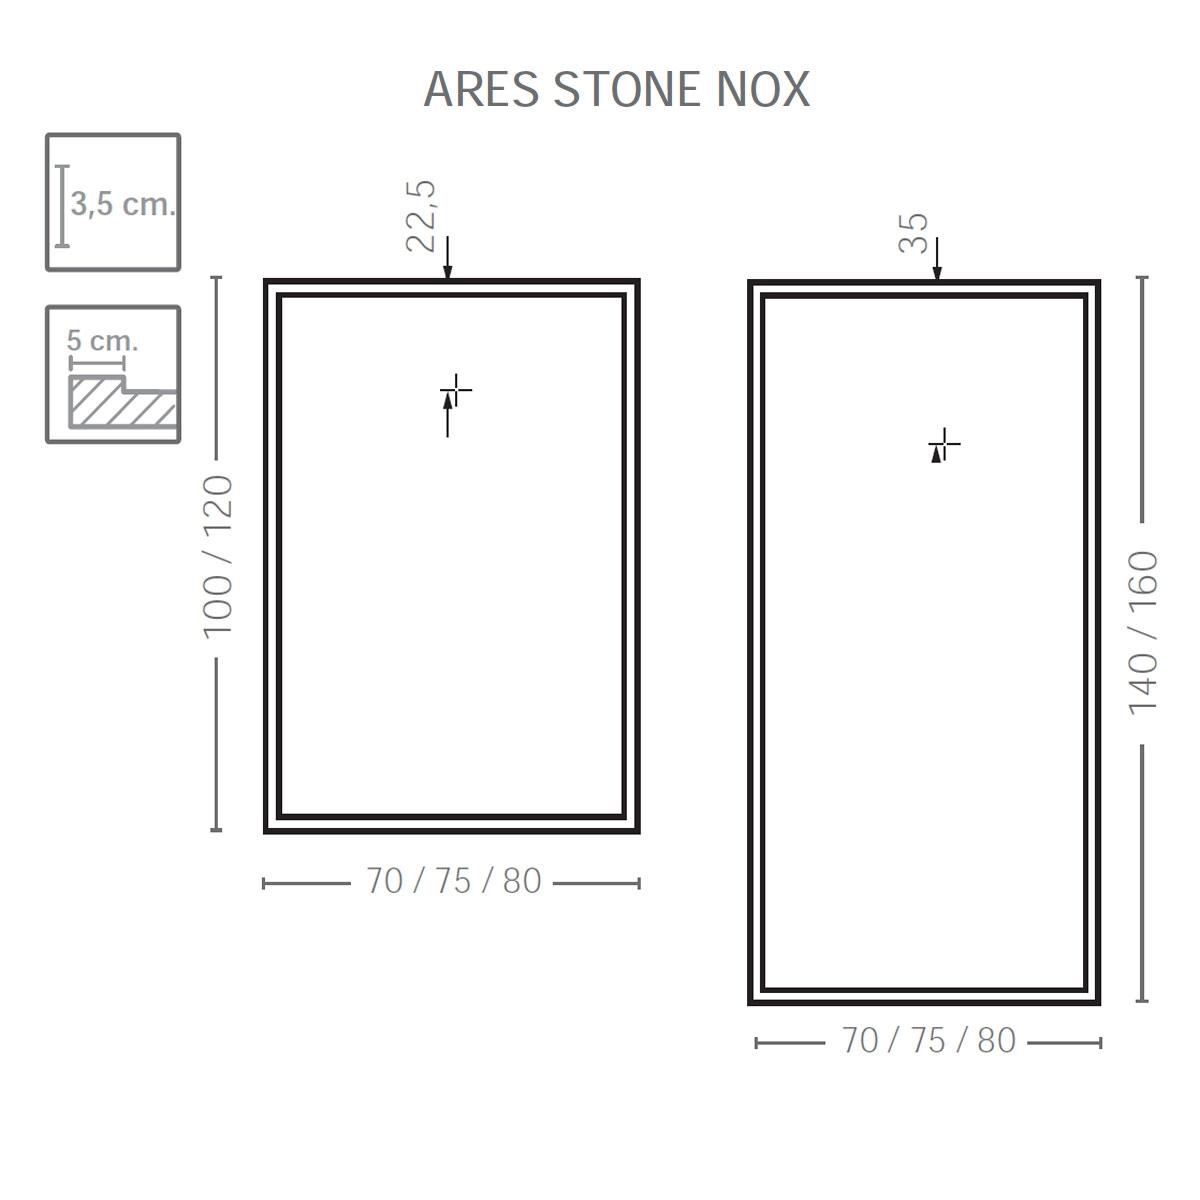 Plato de ducha rectangular 120x80 Ares Stone Nox Basalto